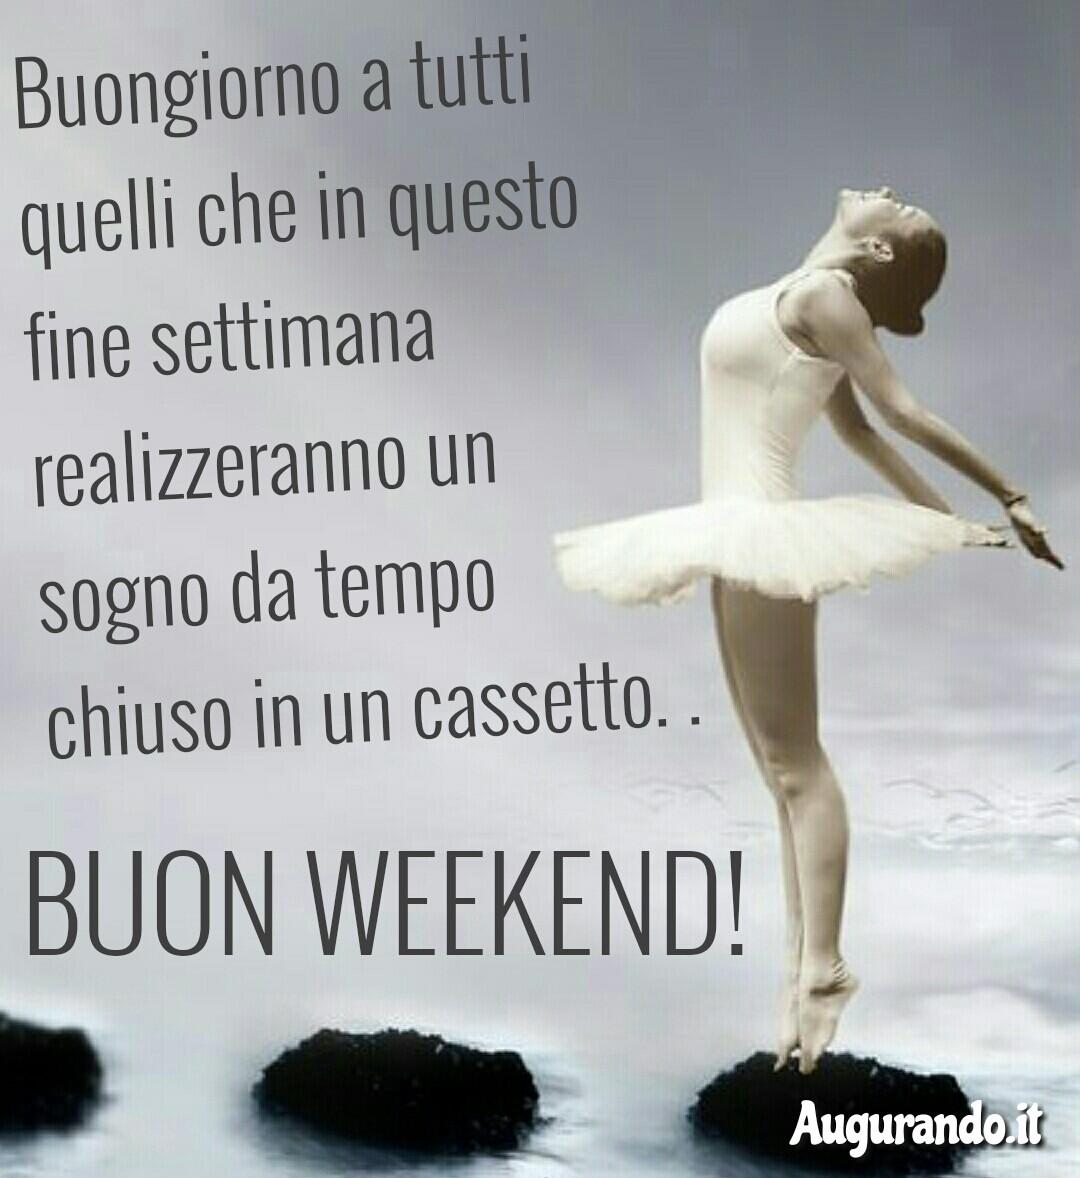 Buon weekend, immagini weekend, sereno fine settimana, immagini fine settimana, sereno weekend, felice venerdì, buon venerdì, buon sabato, buon fine settimana a tutti, buon weekend a tutti